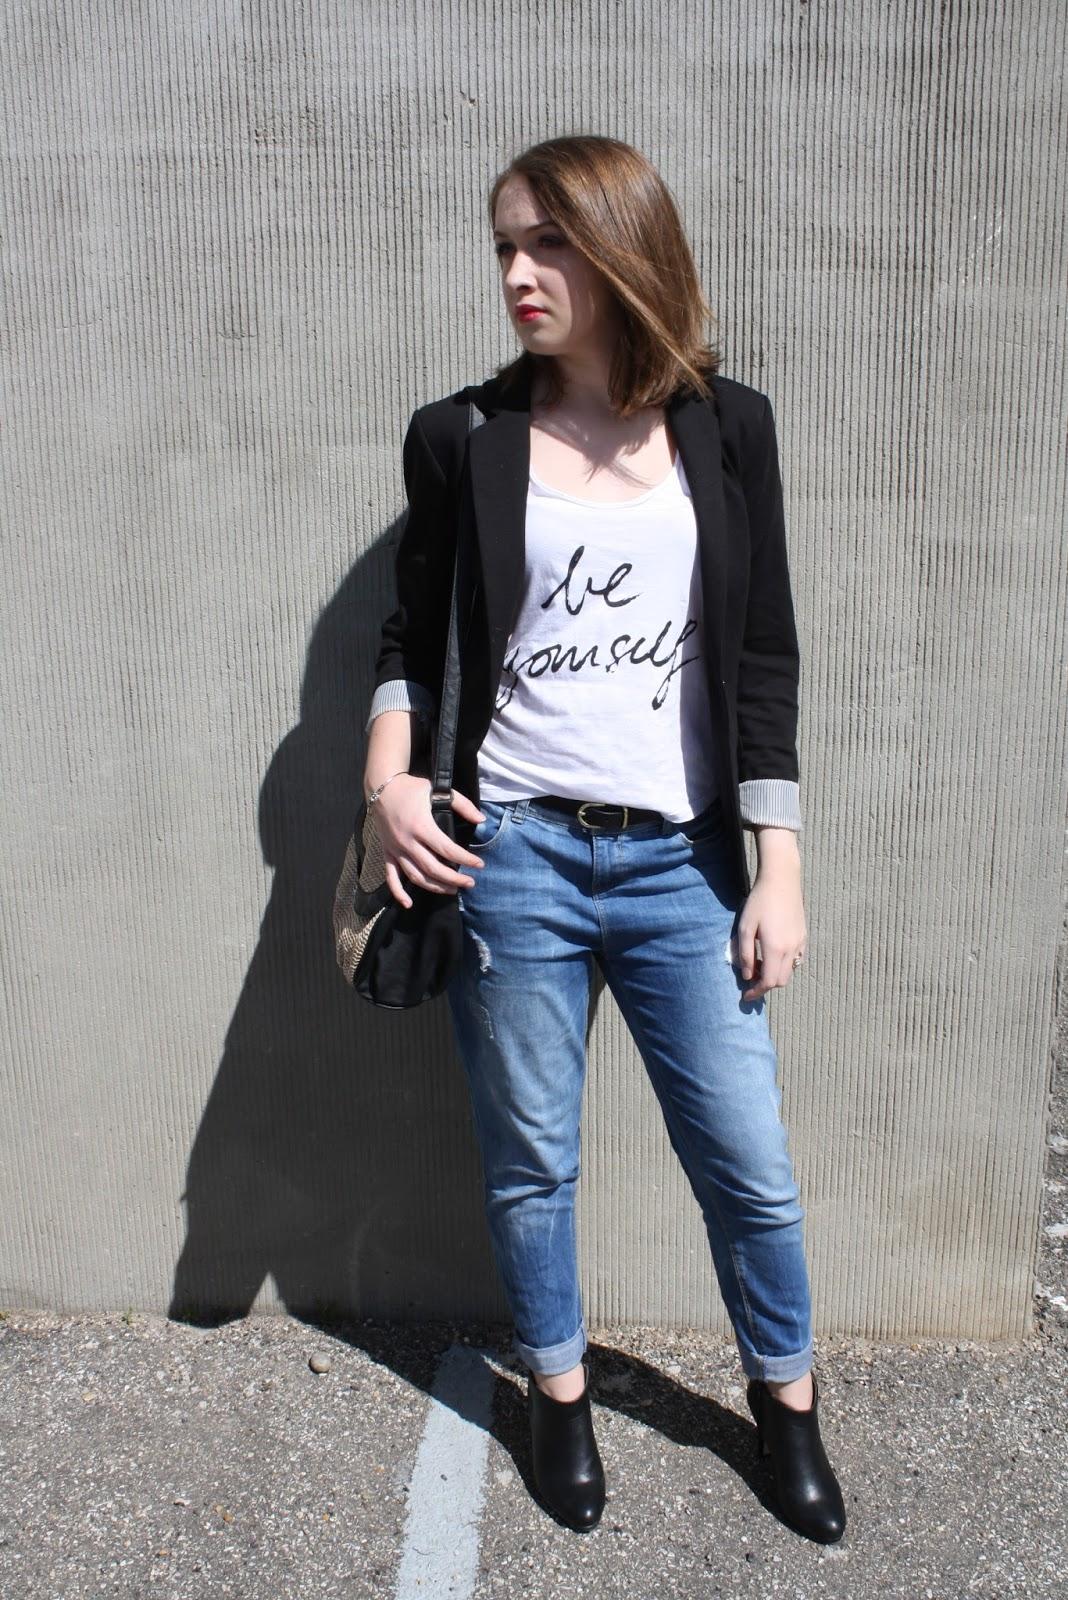 loungeforgirls blog beaut mode et lifestyle be yourself 4073da3068b5